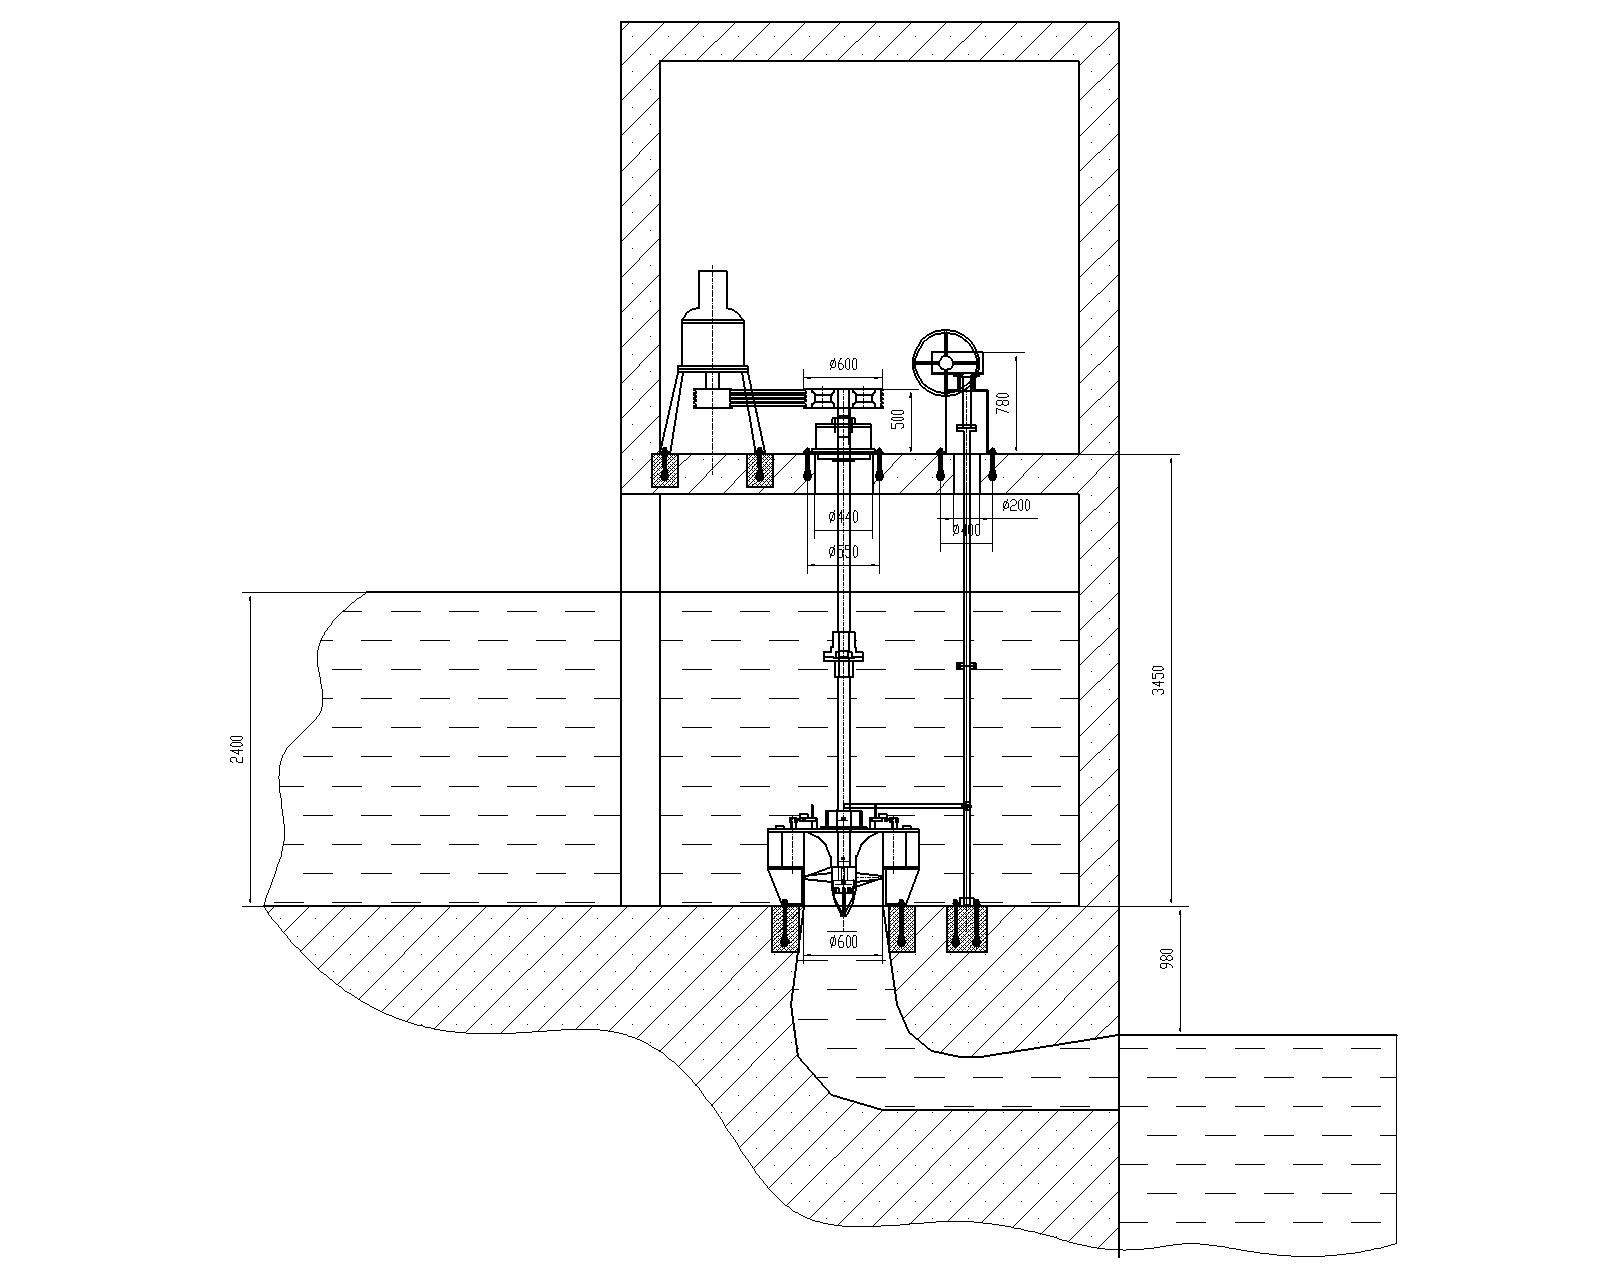 60kaplan turbine